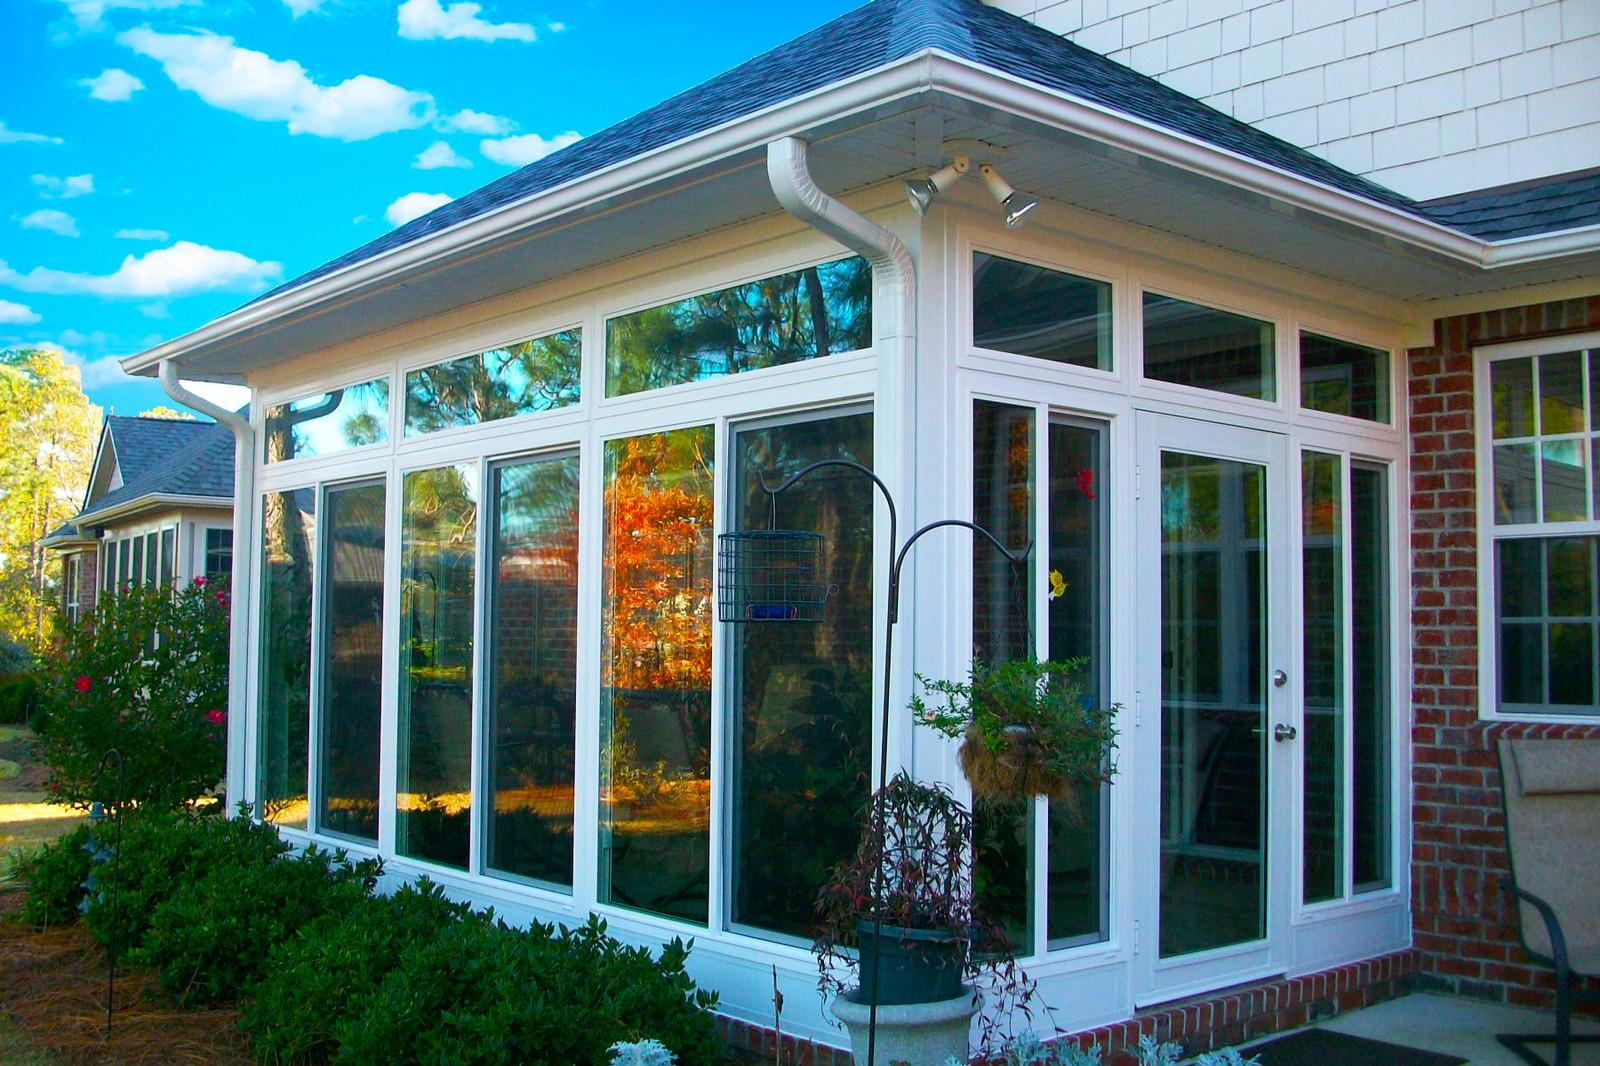 Windows For Sunrooms And Patio Enclosures North Carolina | Fullscreen Page